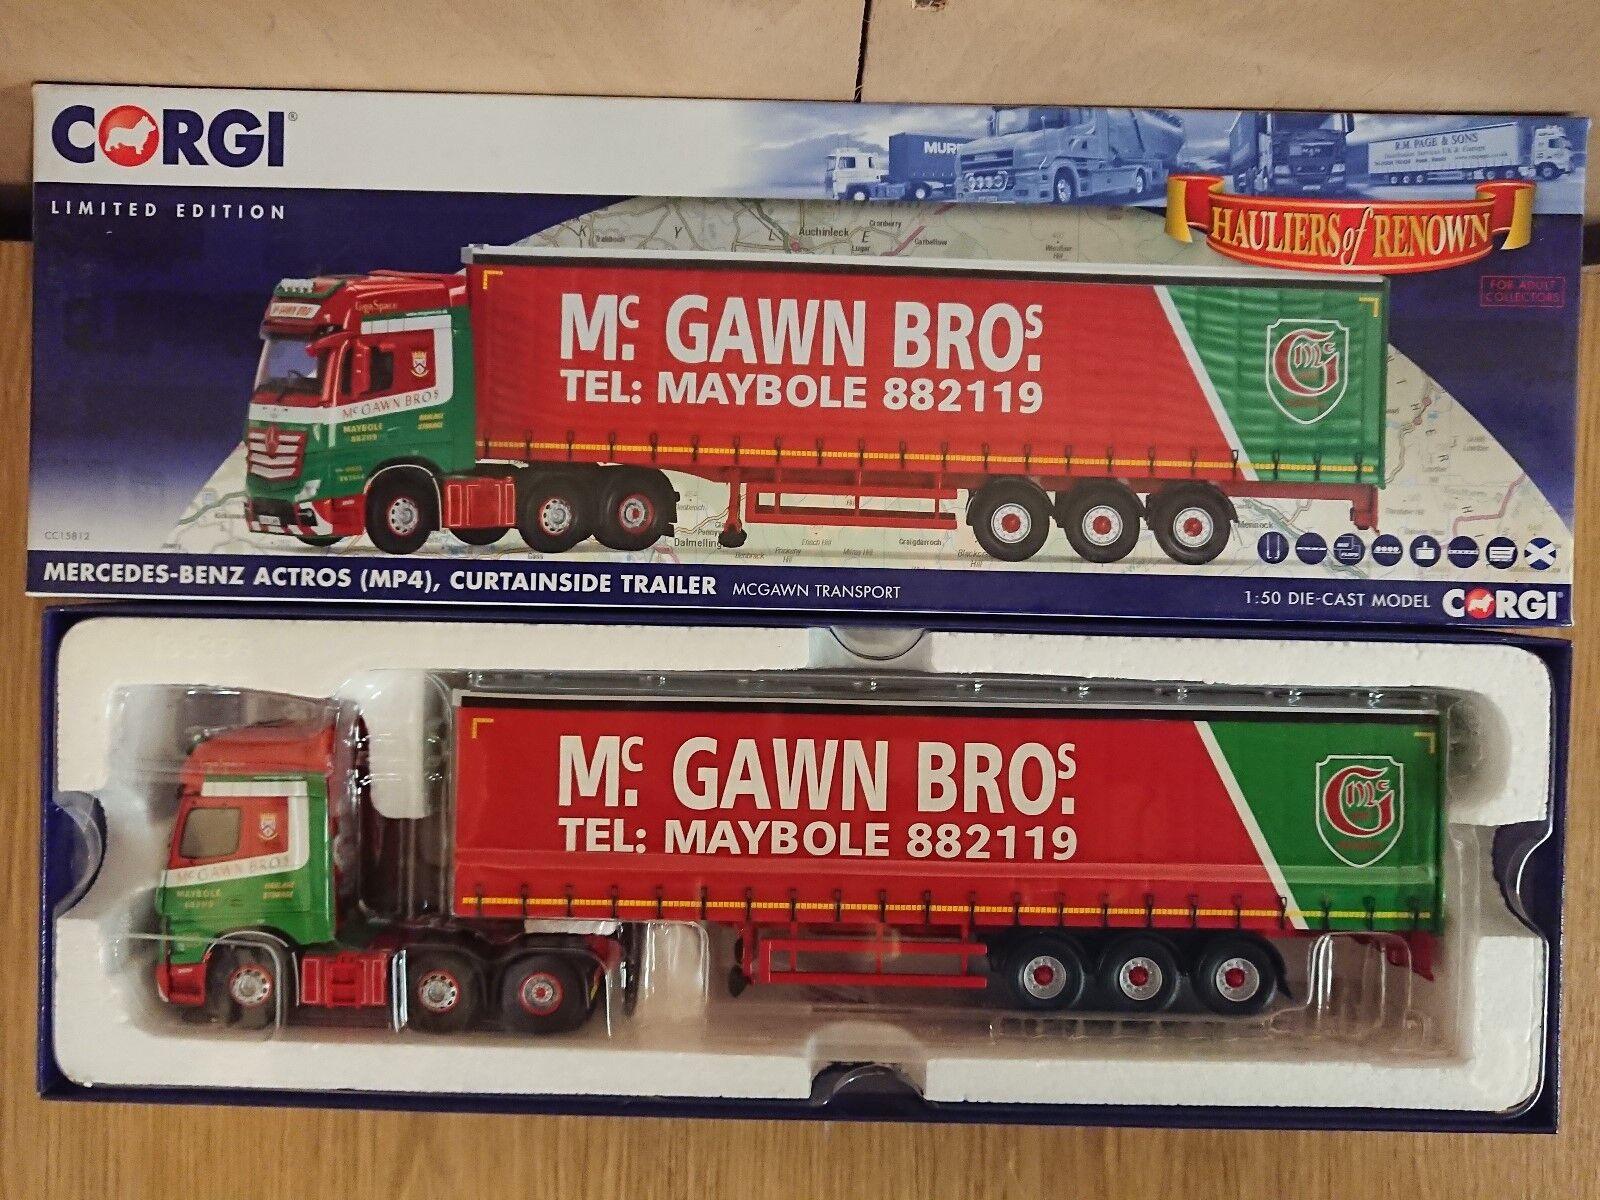 CORGI CC15812 MERCEDES ACTROS Curtainside mcgawn Bros. Ltd Ed. No 407 de 800